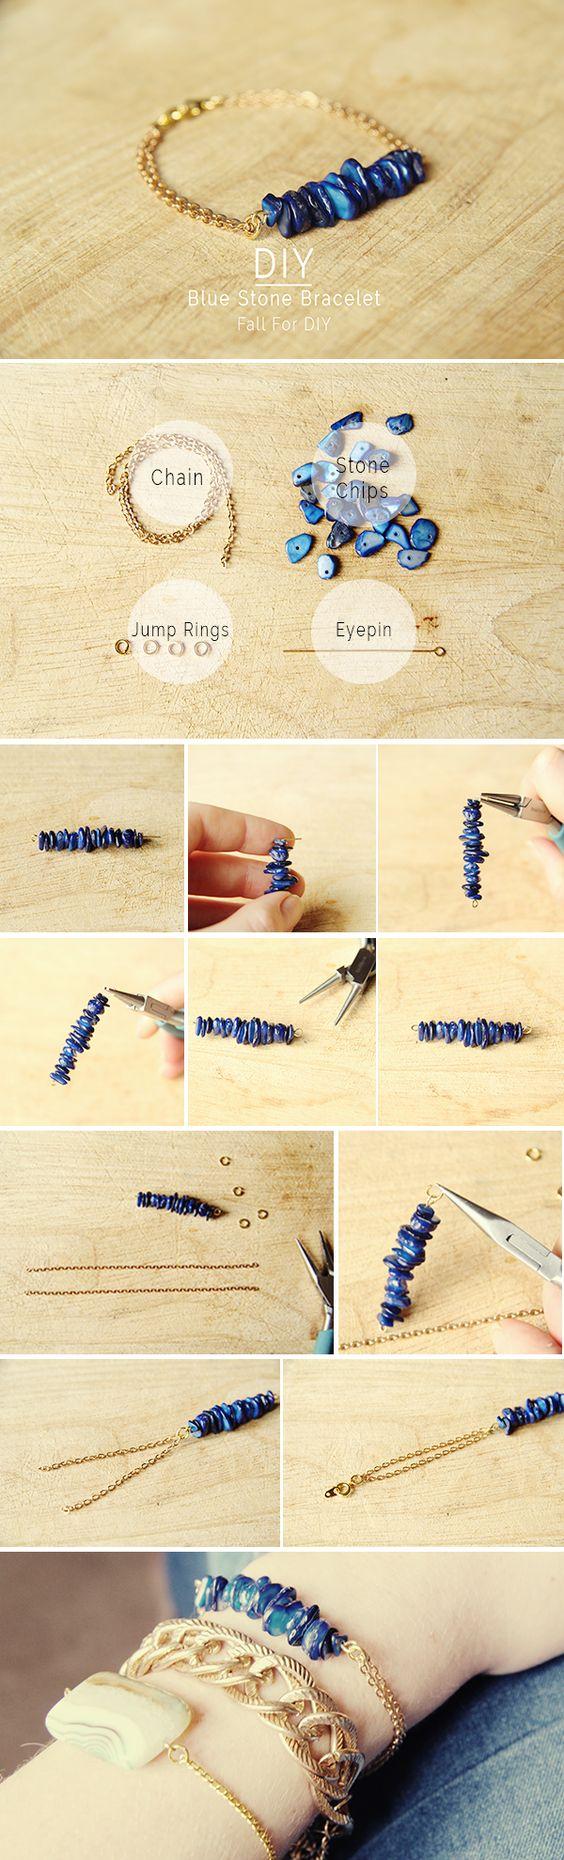 Cute bracelet diy: